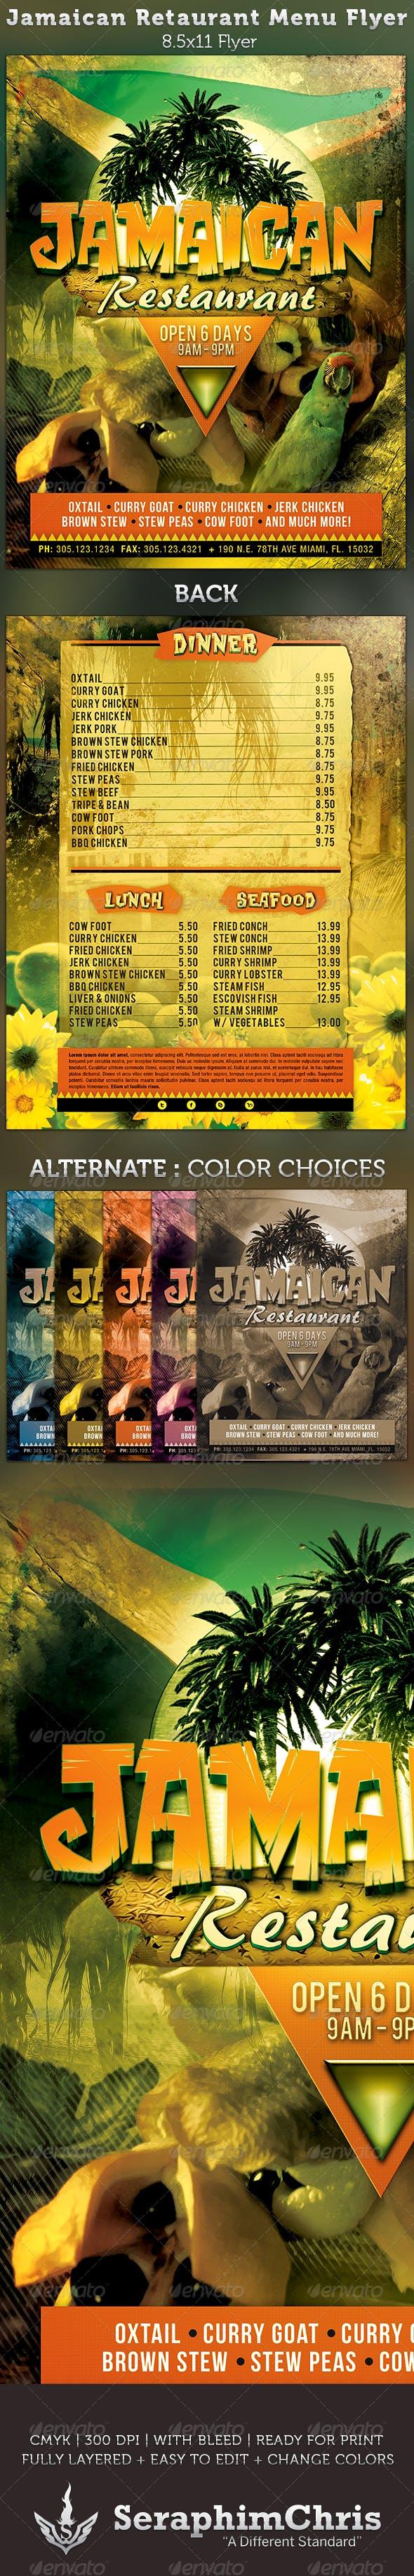 jamaican restaurant menu flyer template by seraphimchris graphicriver